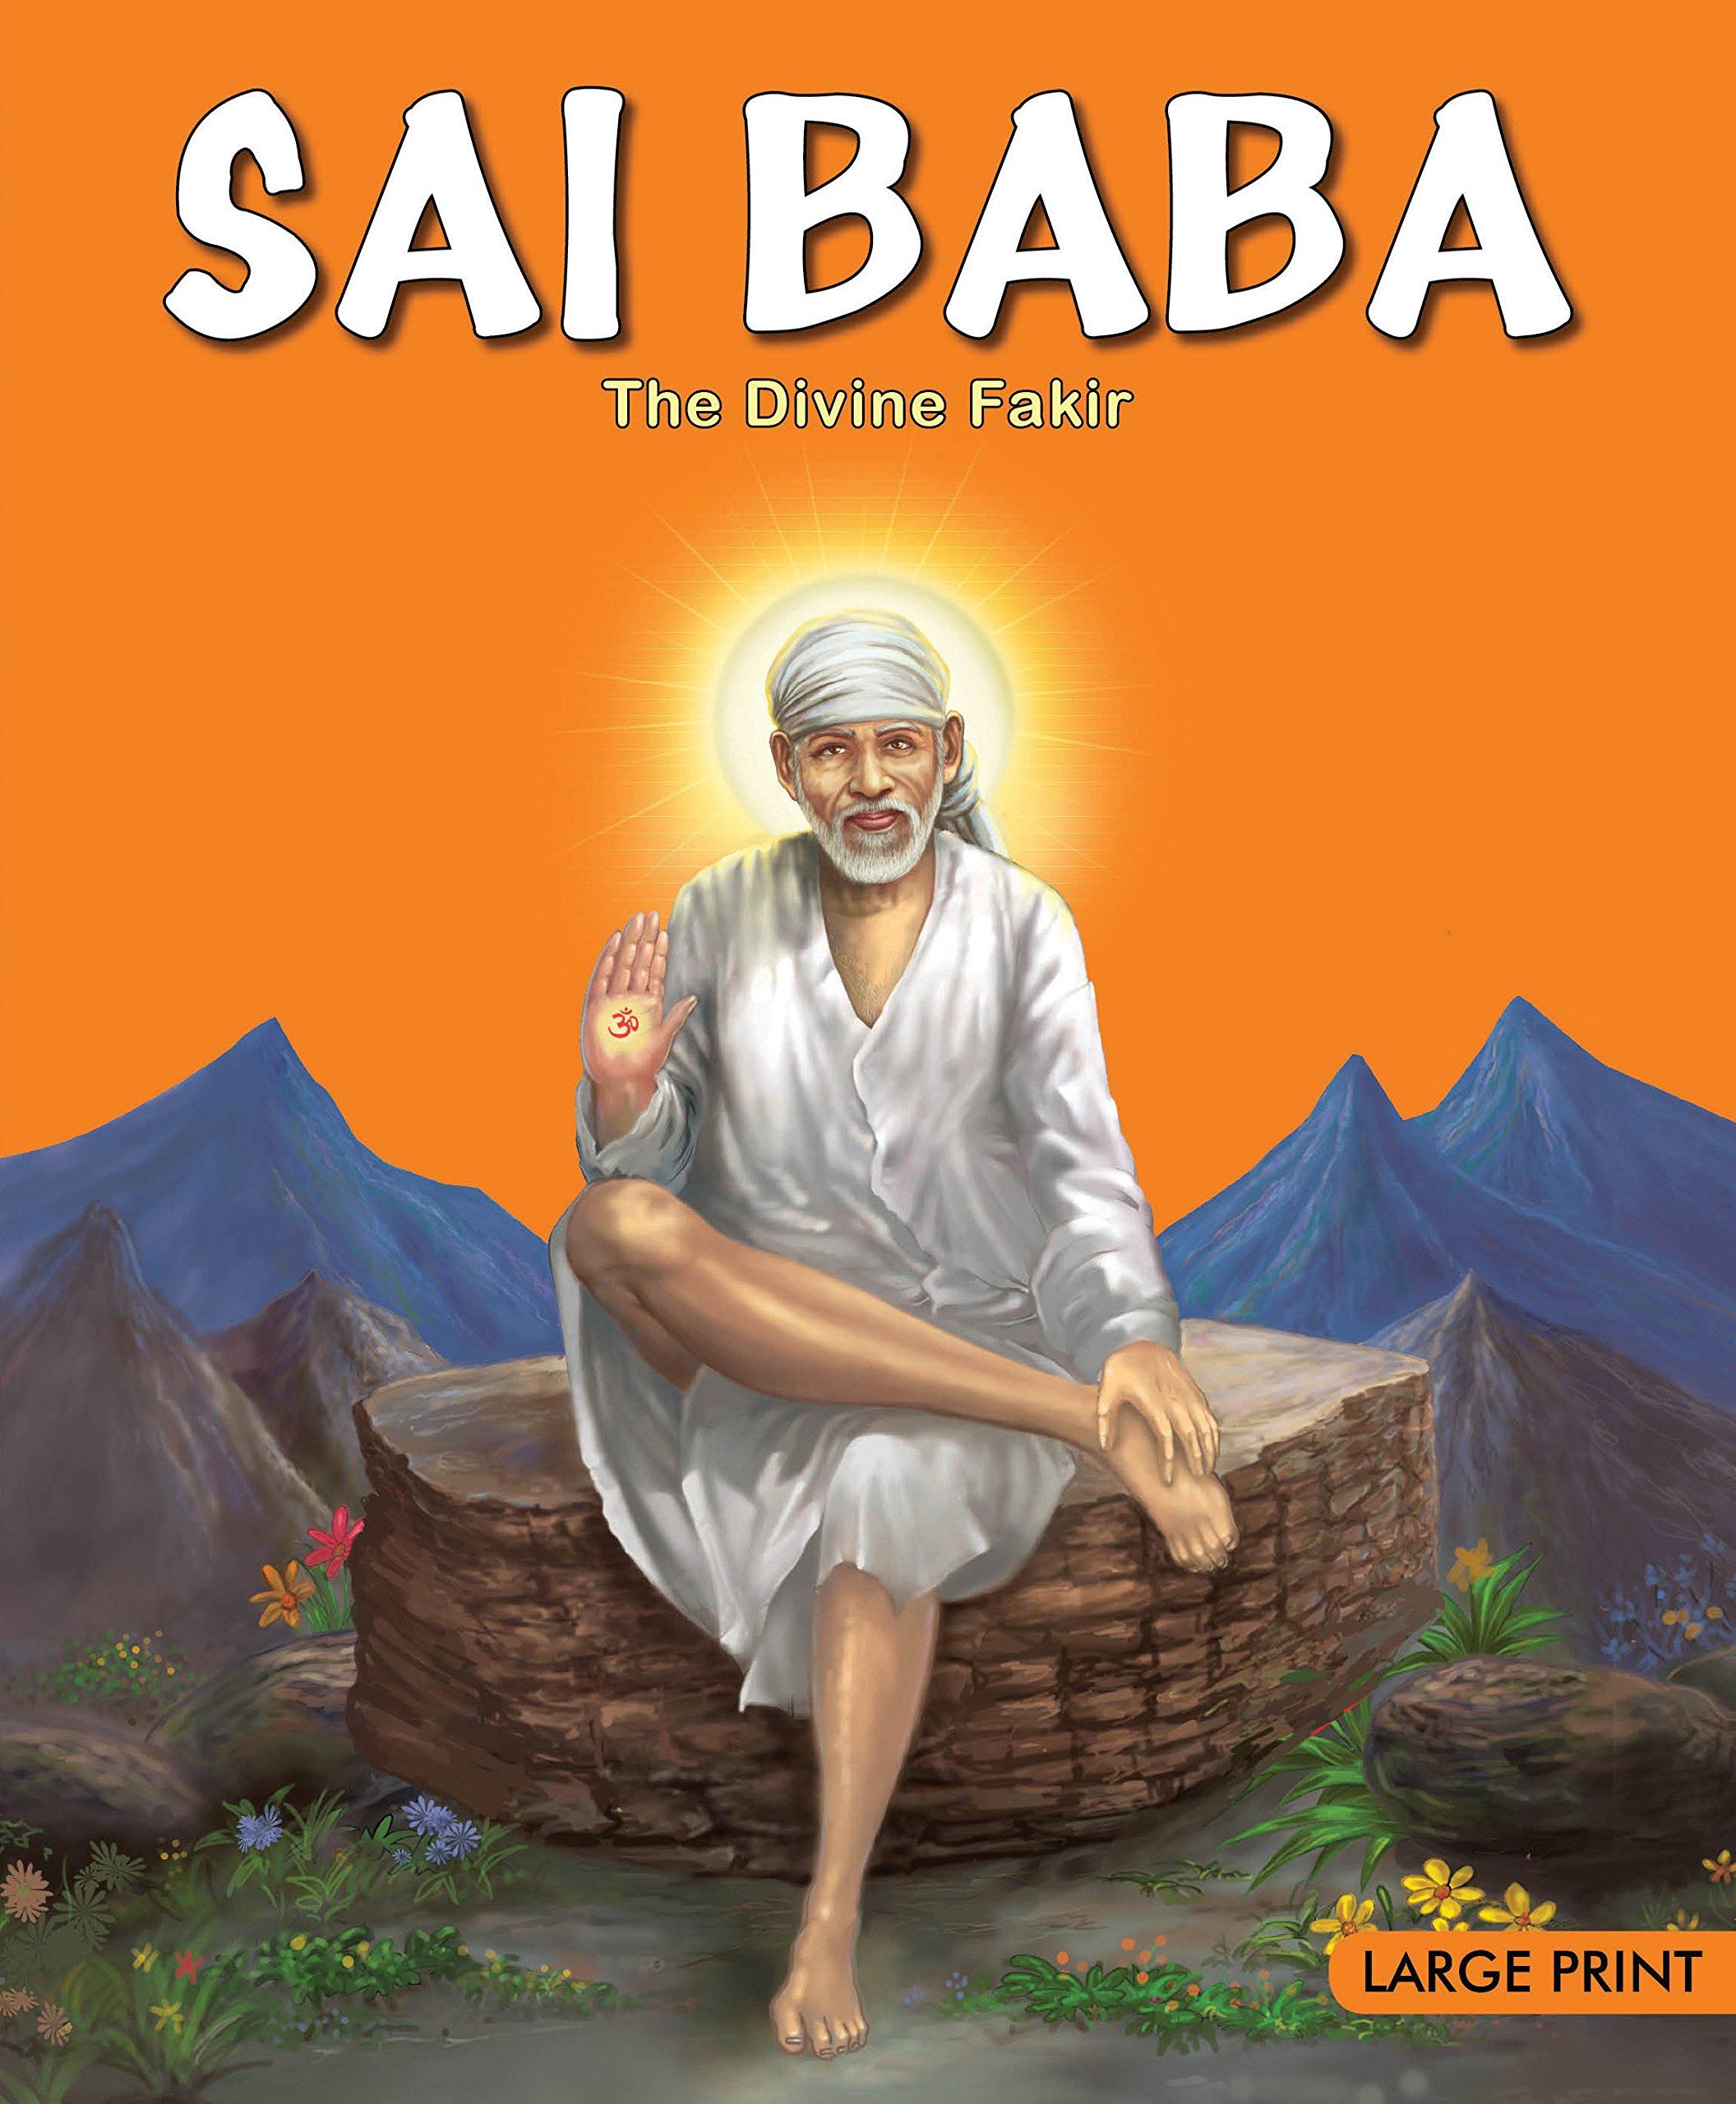 Large Print: SAI BABA - The Divine Fakir